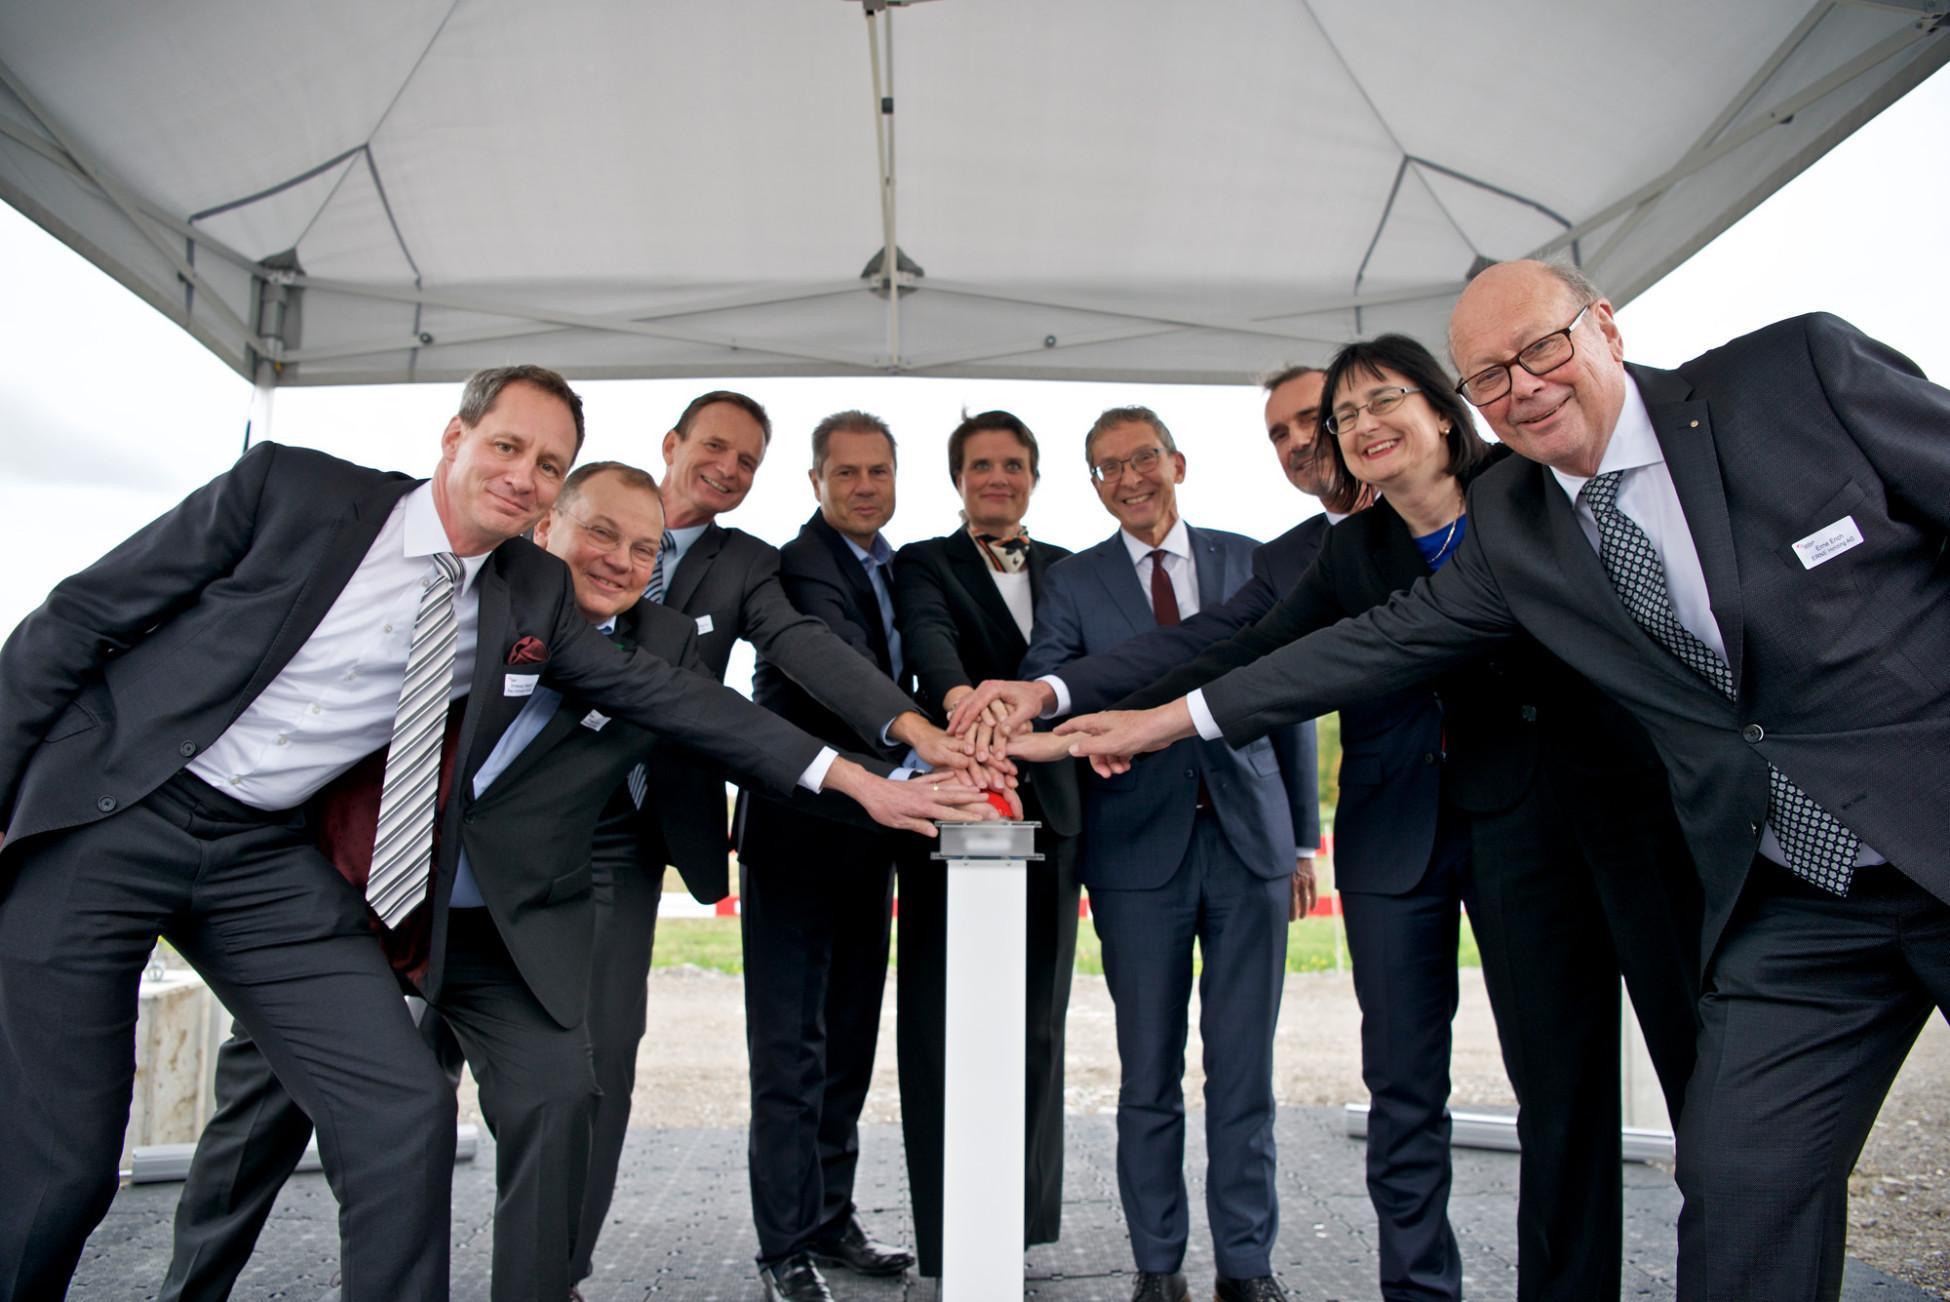 Lancement de Park Innovaare, Villigen